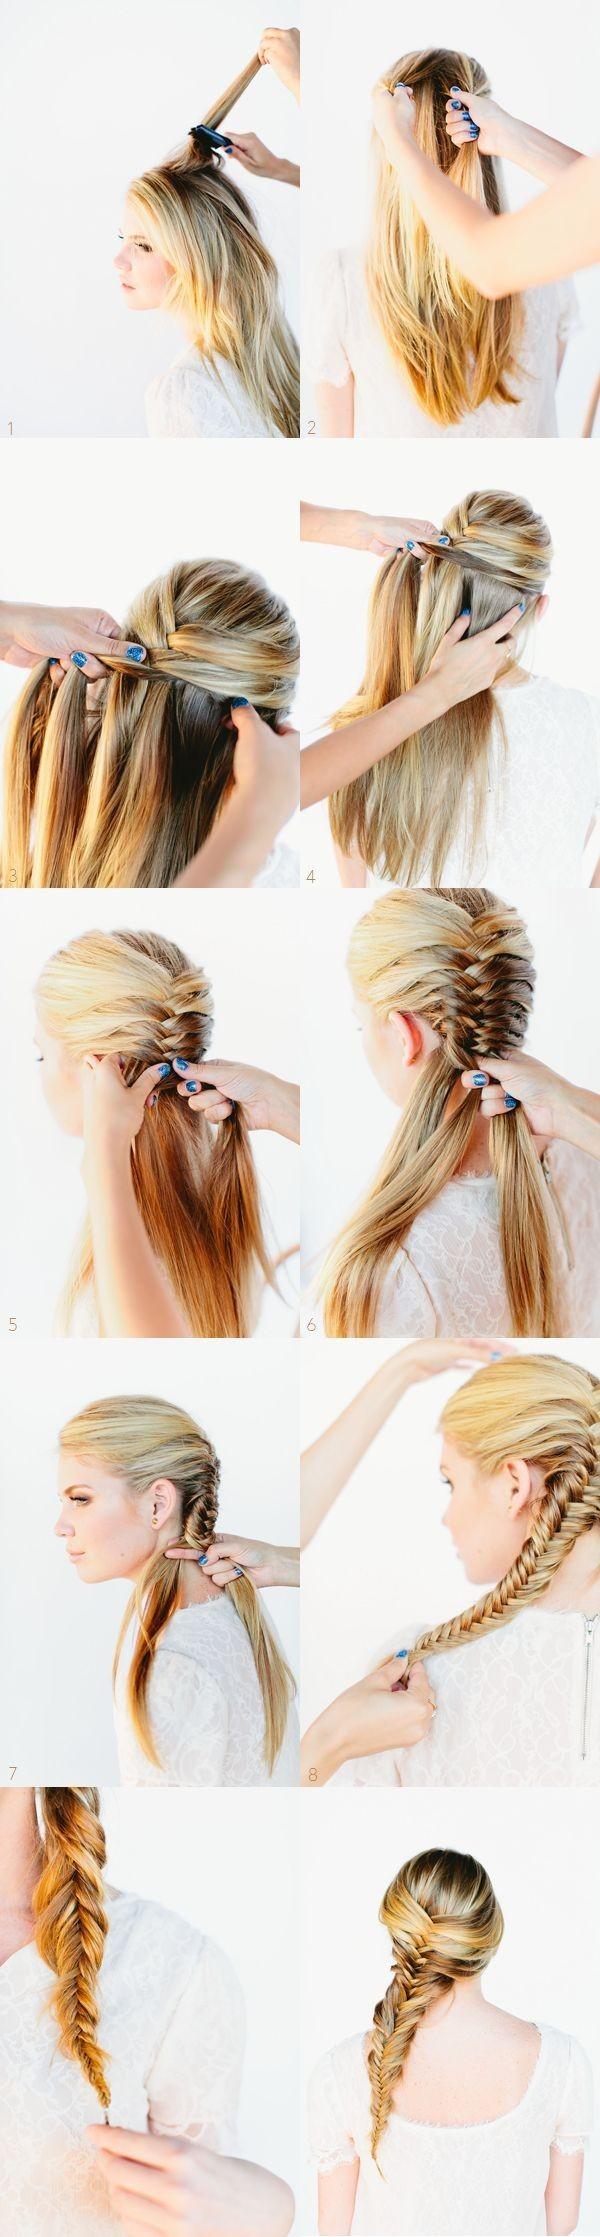 Side Fishtail Braid Hairstyle Tutorial